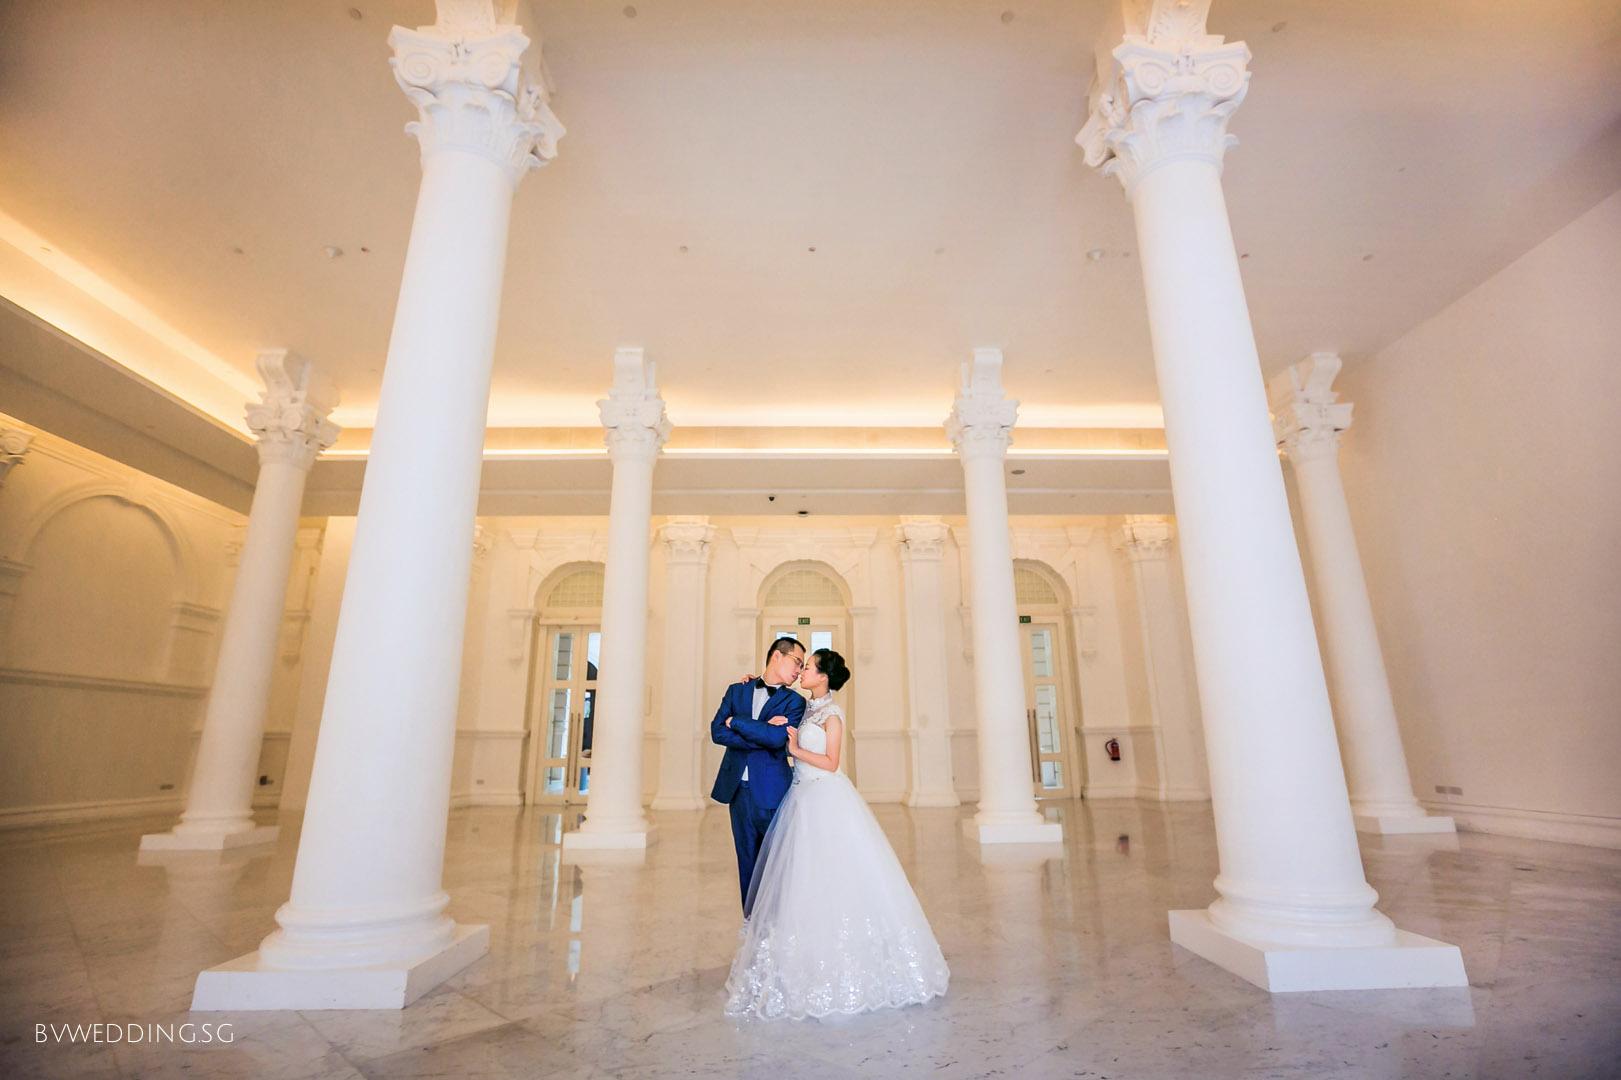 Pre-wedding Photoshoot at Victoria Theatre